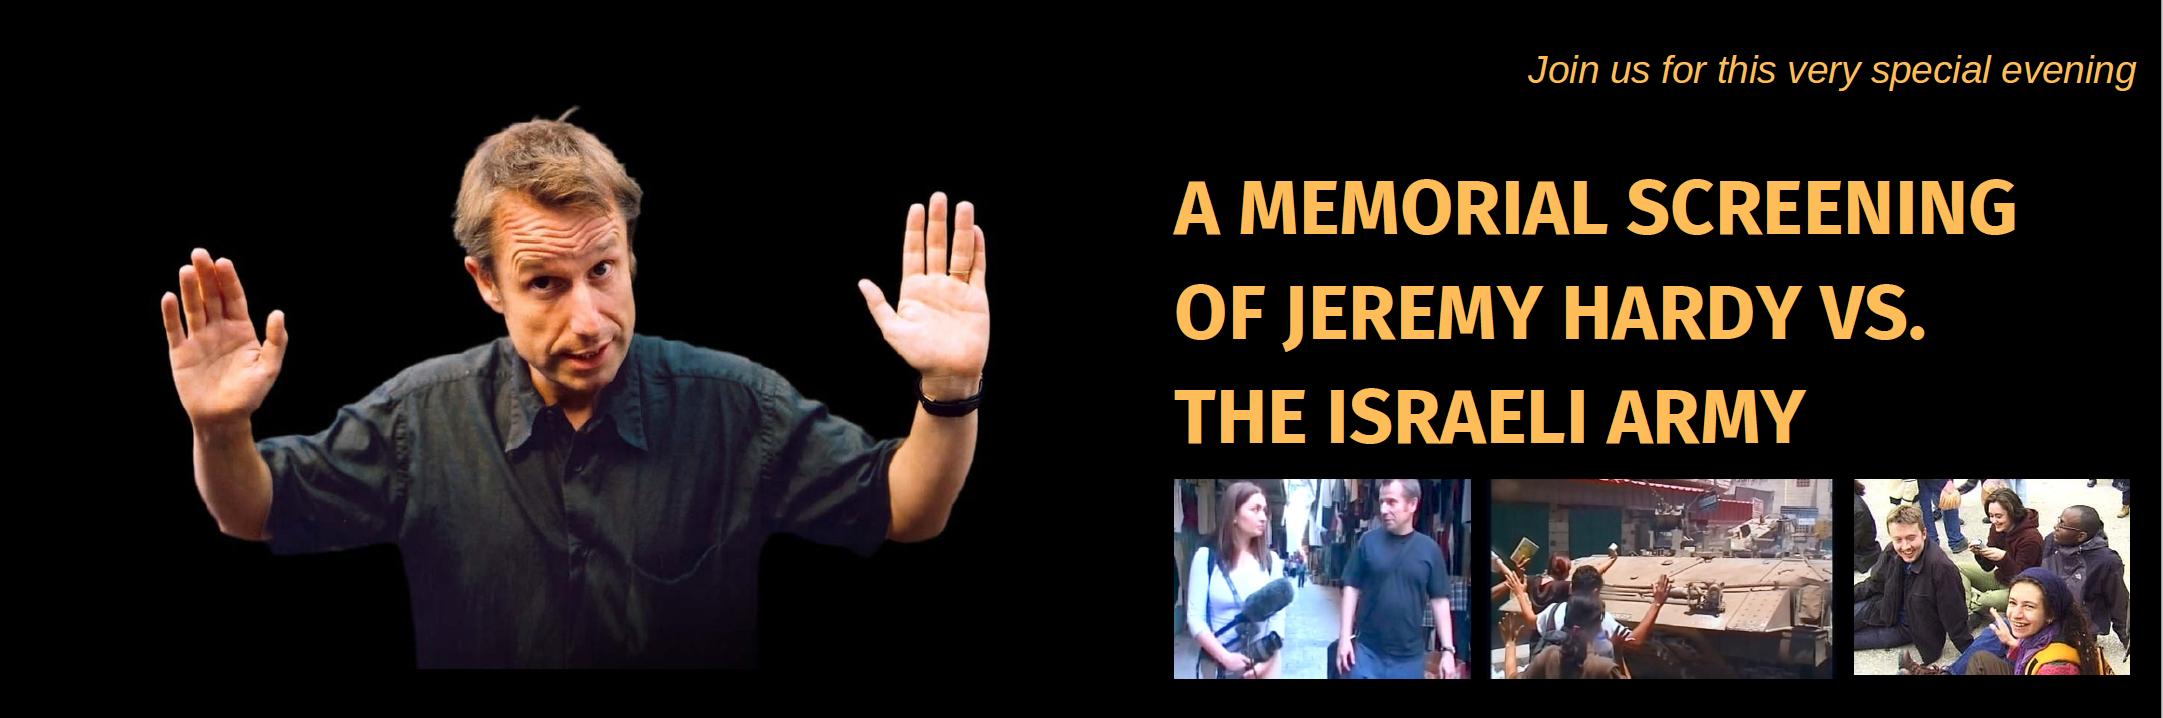 Jeremy Hardy versus Israeli Army header